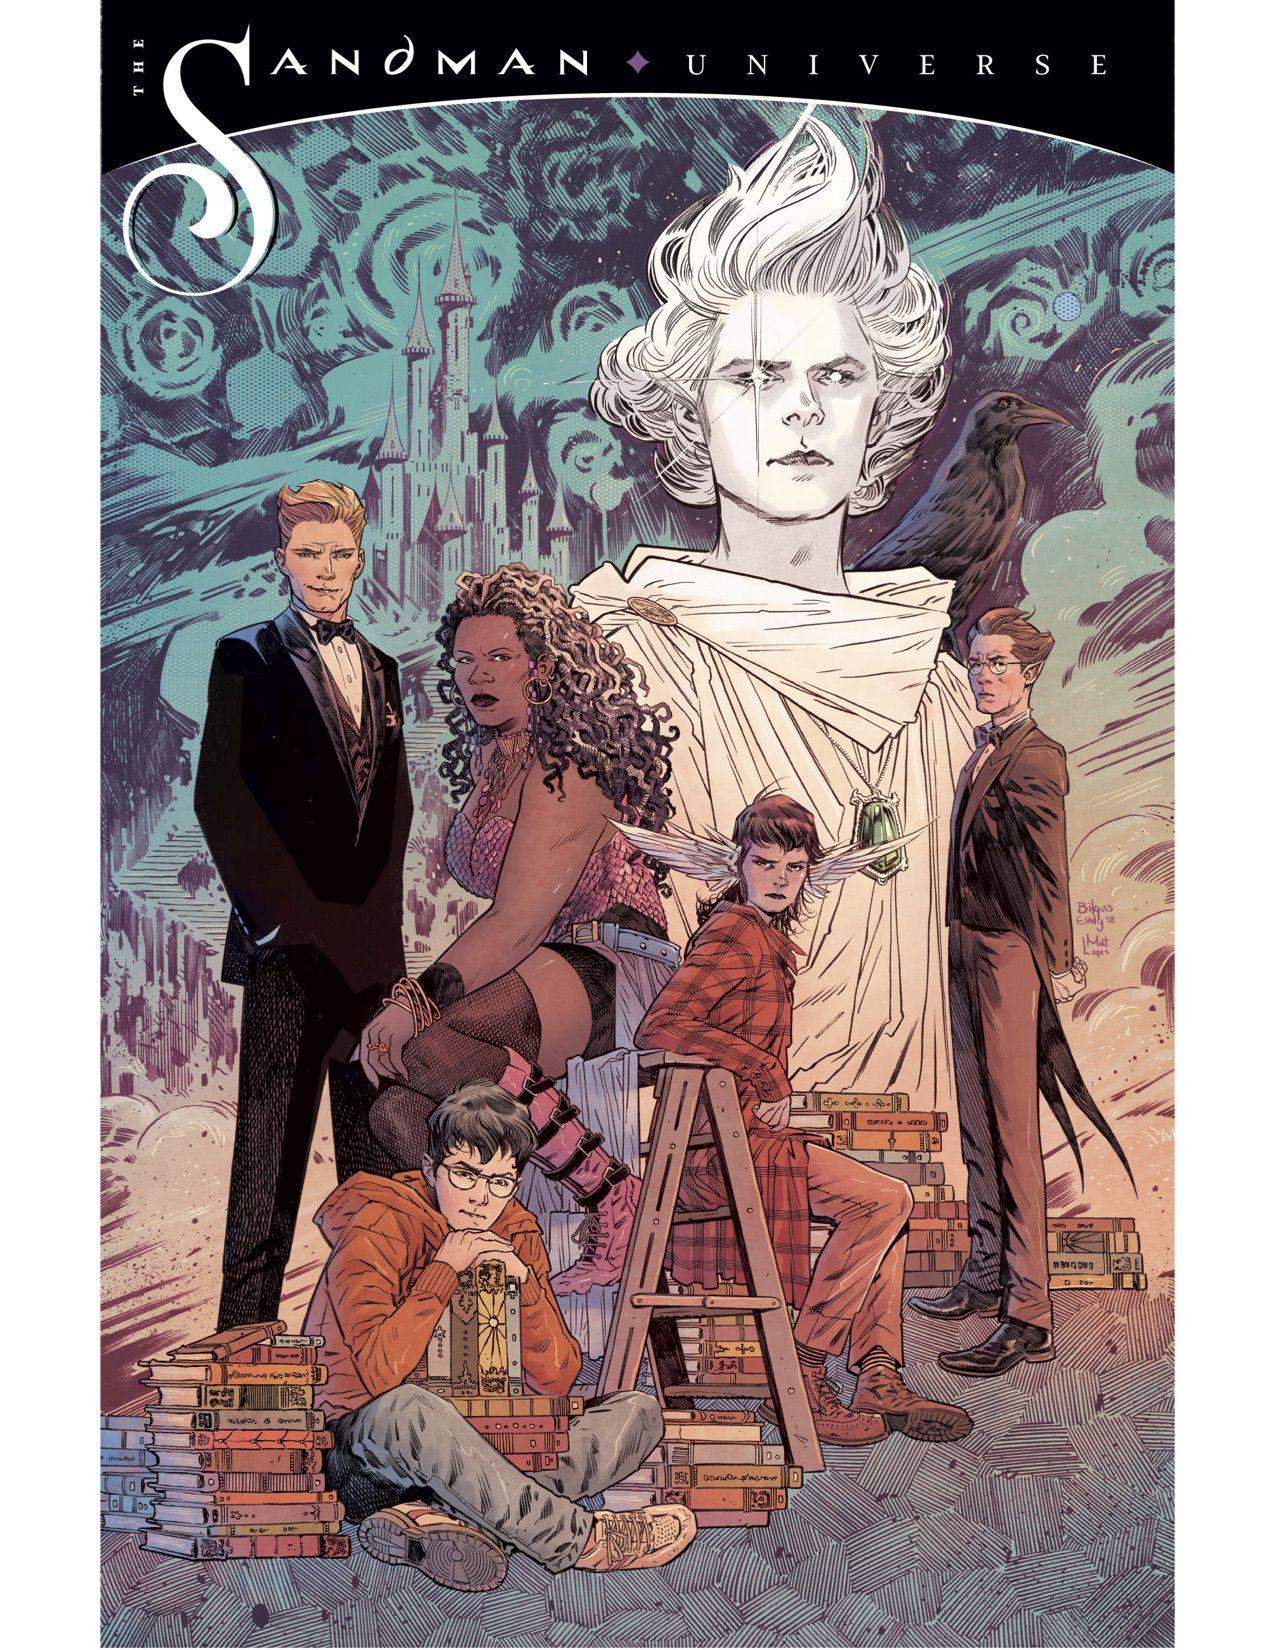 Sandman Universe, Books of Magic